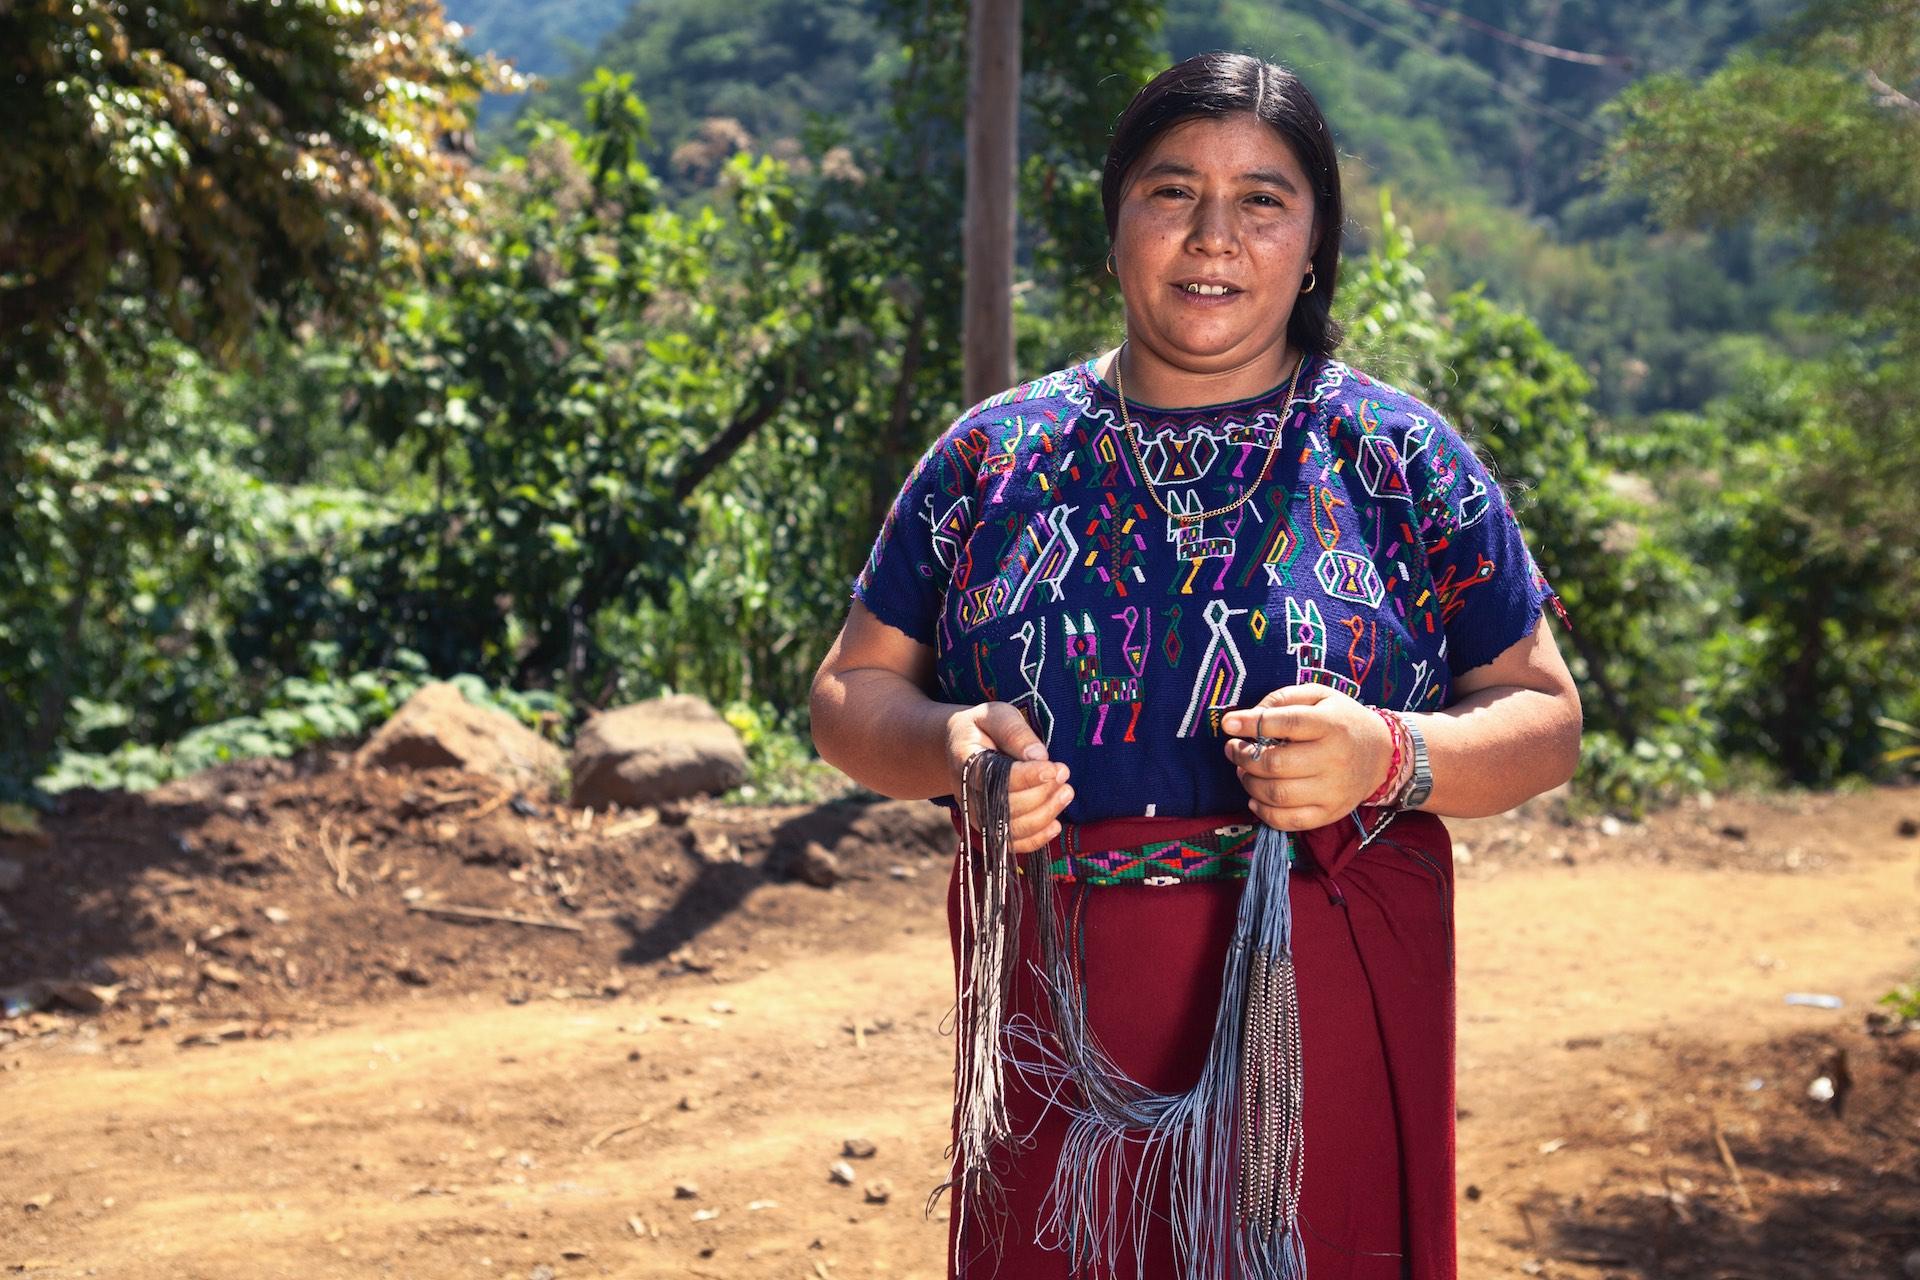 Doña María Garcia ~ Artesanias Ixil, Guatemala. Foto: Garret Byrum